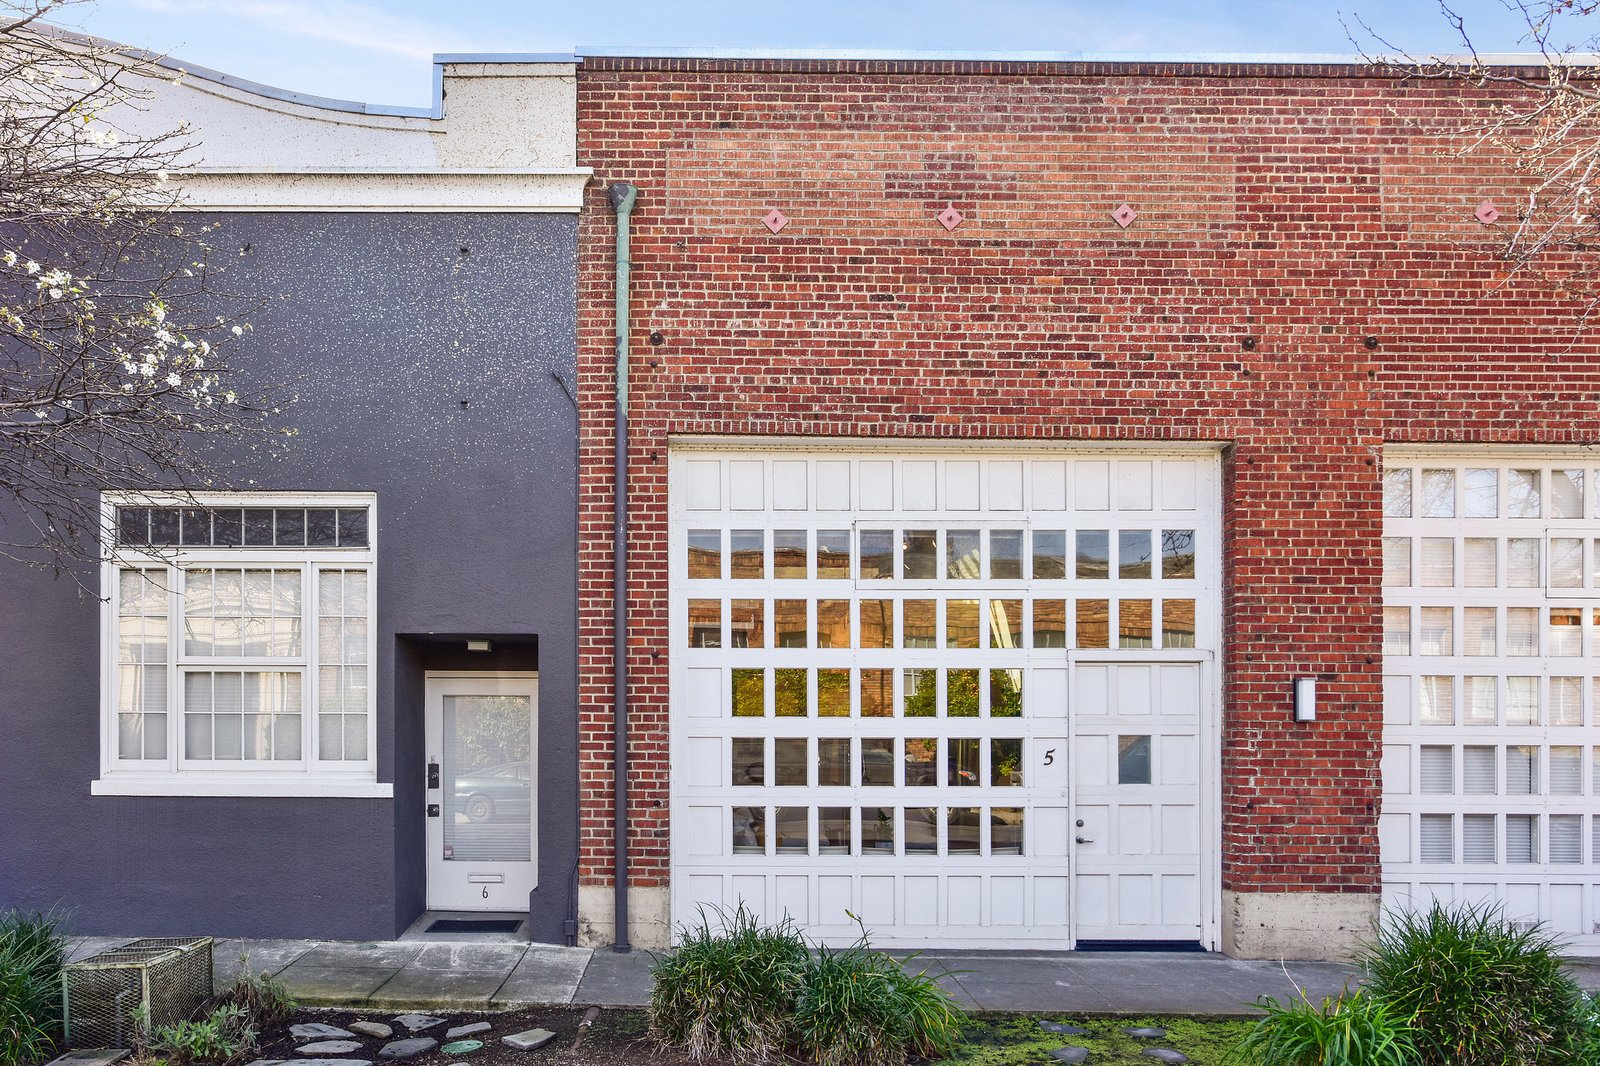 Horton Street Lofts in Emeryville